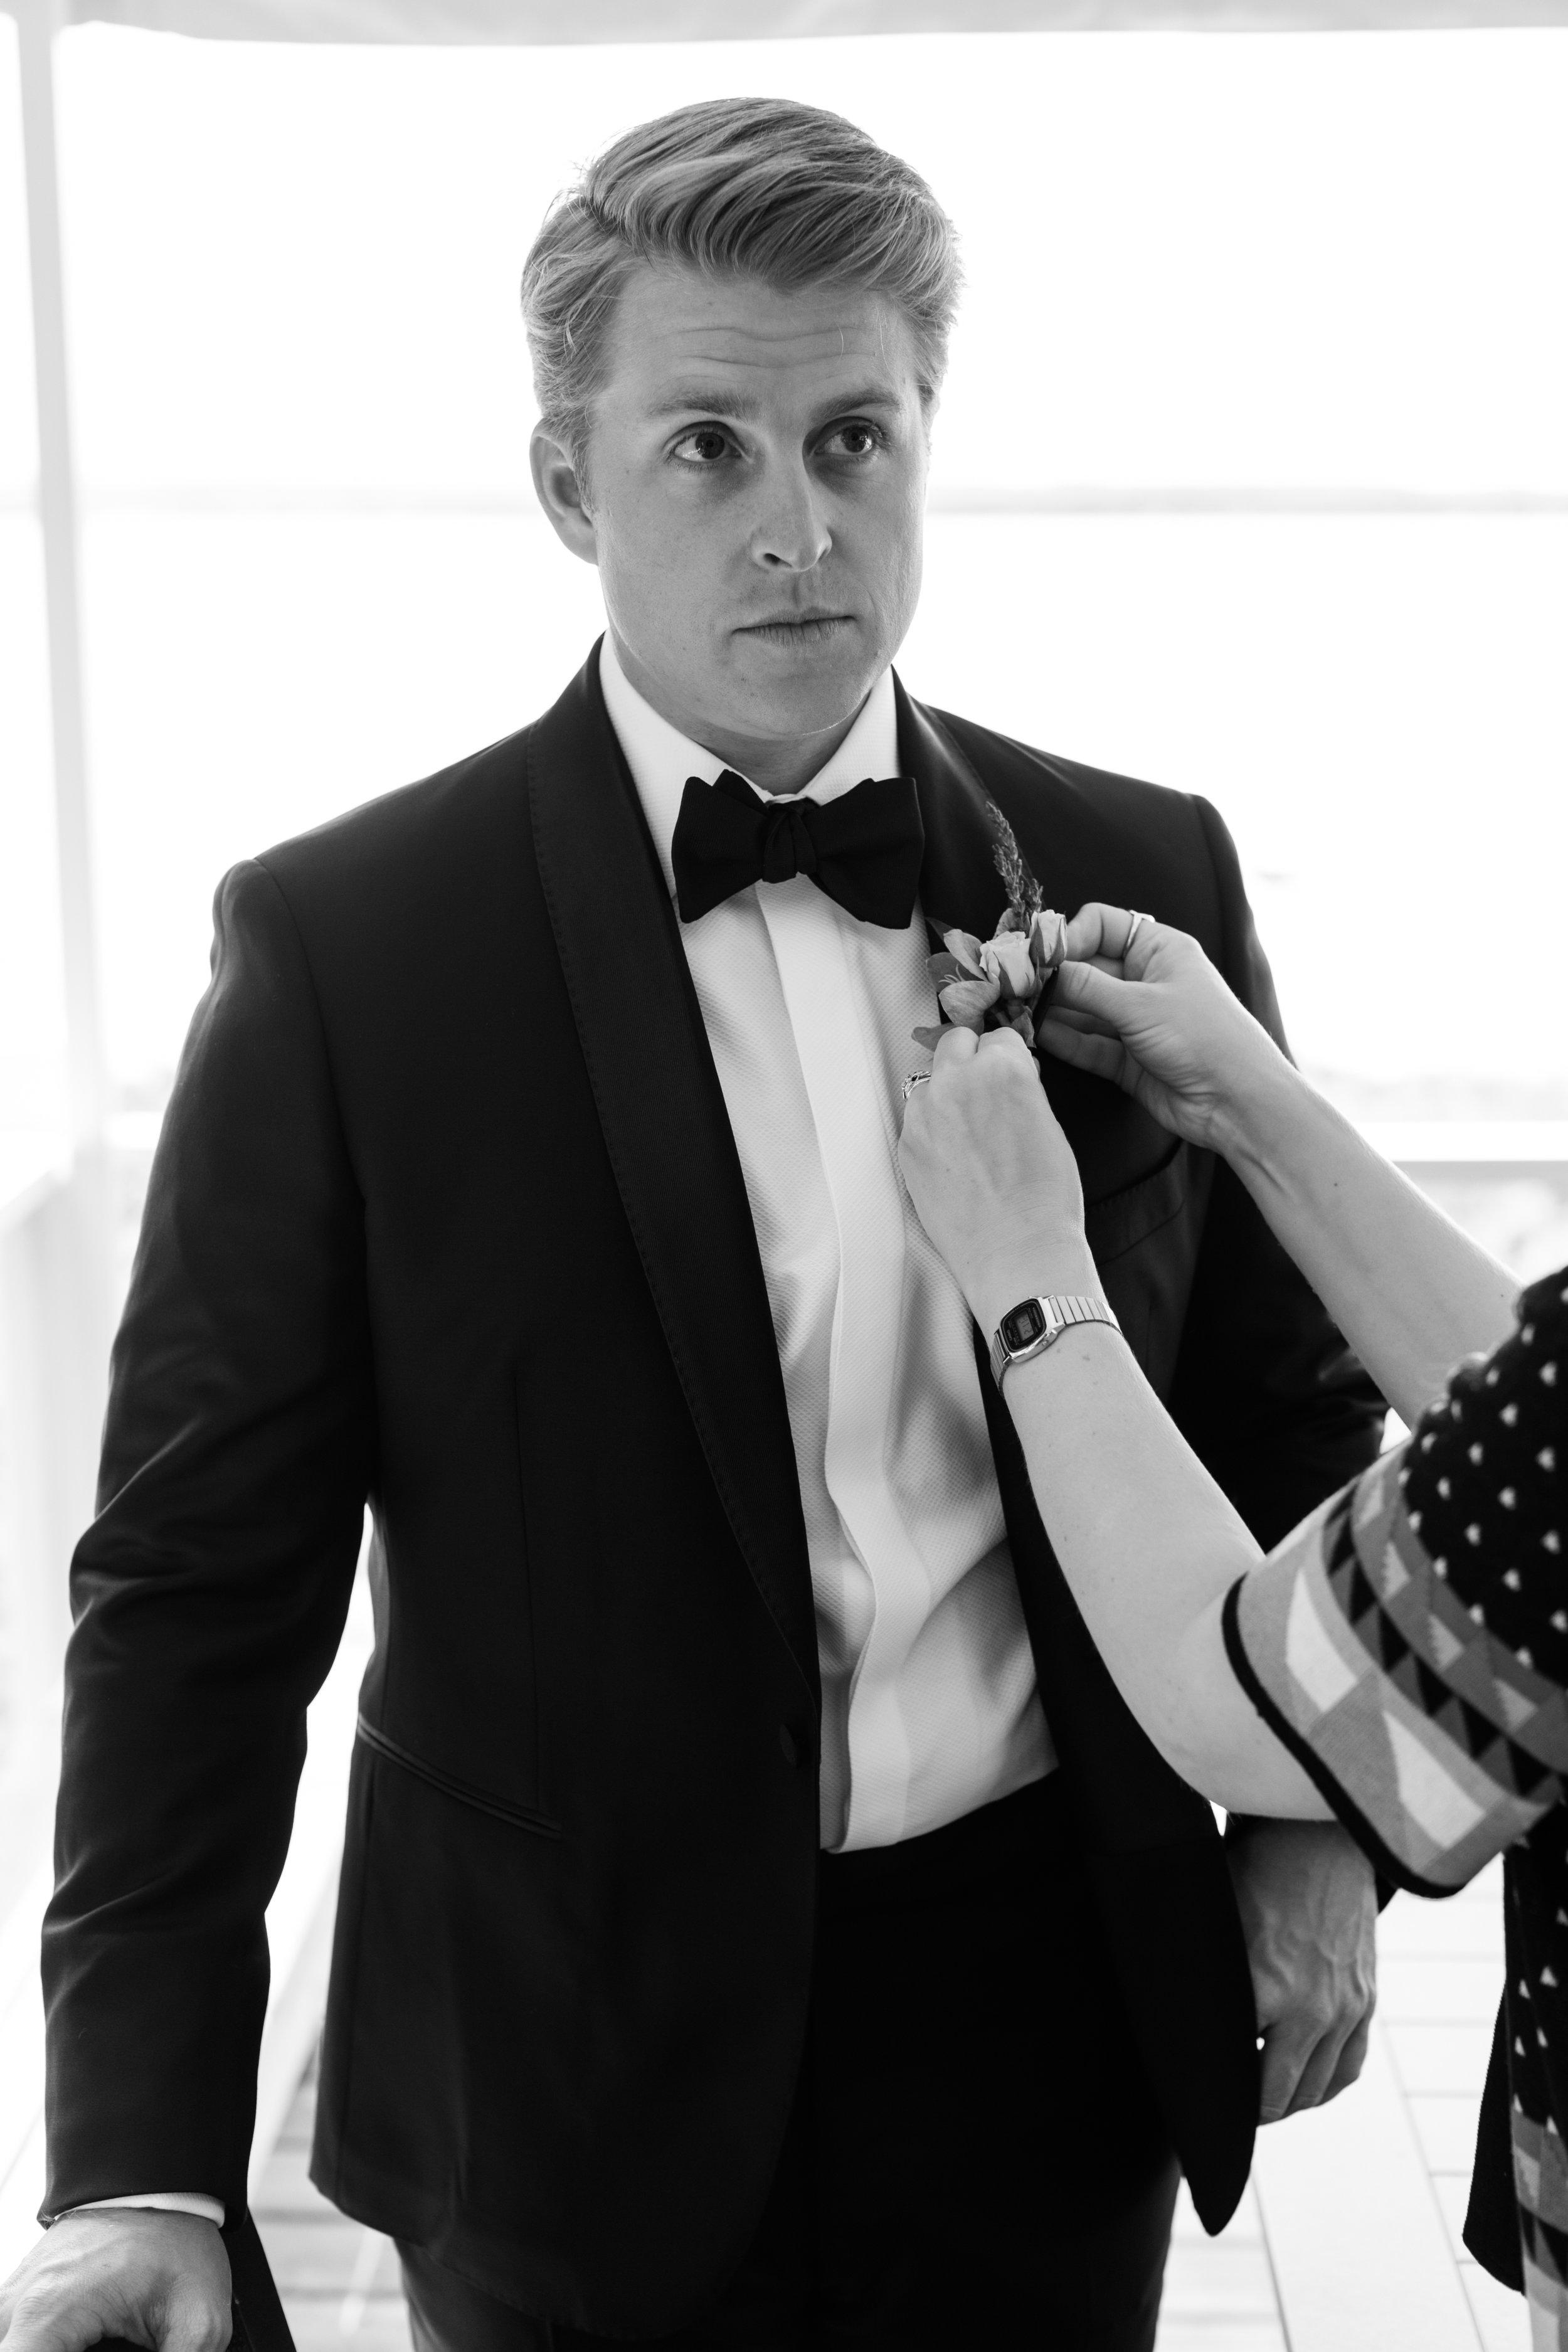 Coffman+Wedding+Getting+Ready+Guys-54.jpg